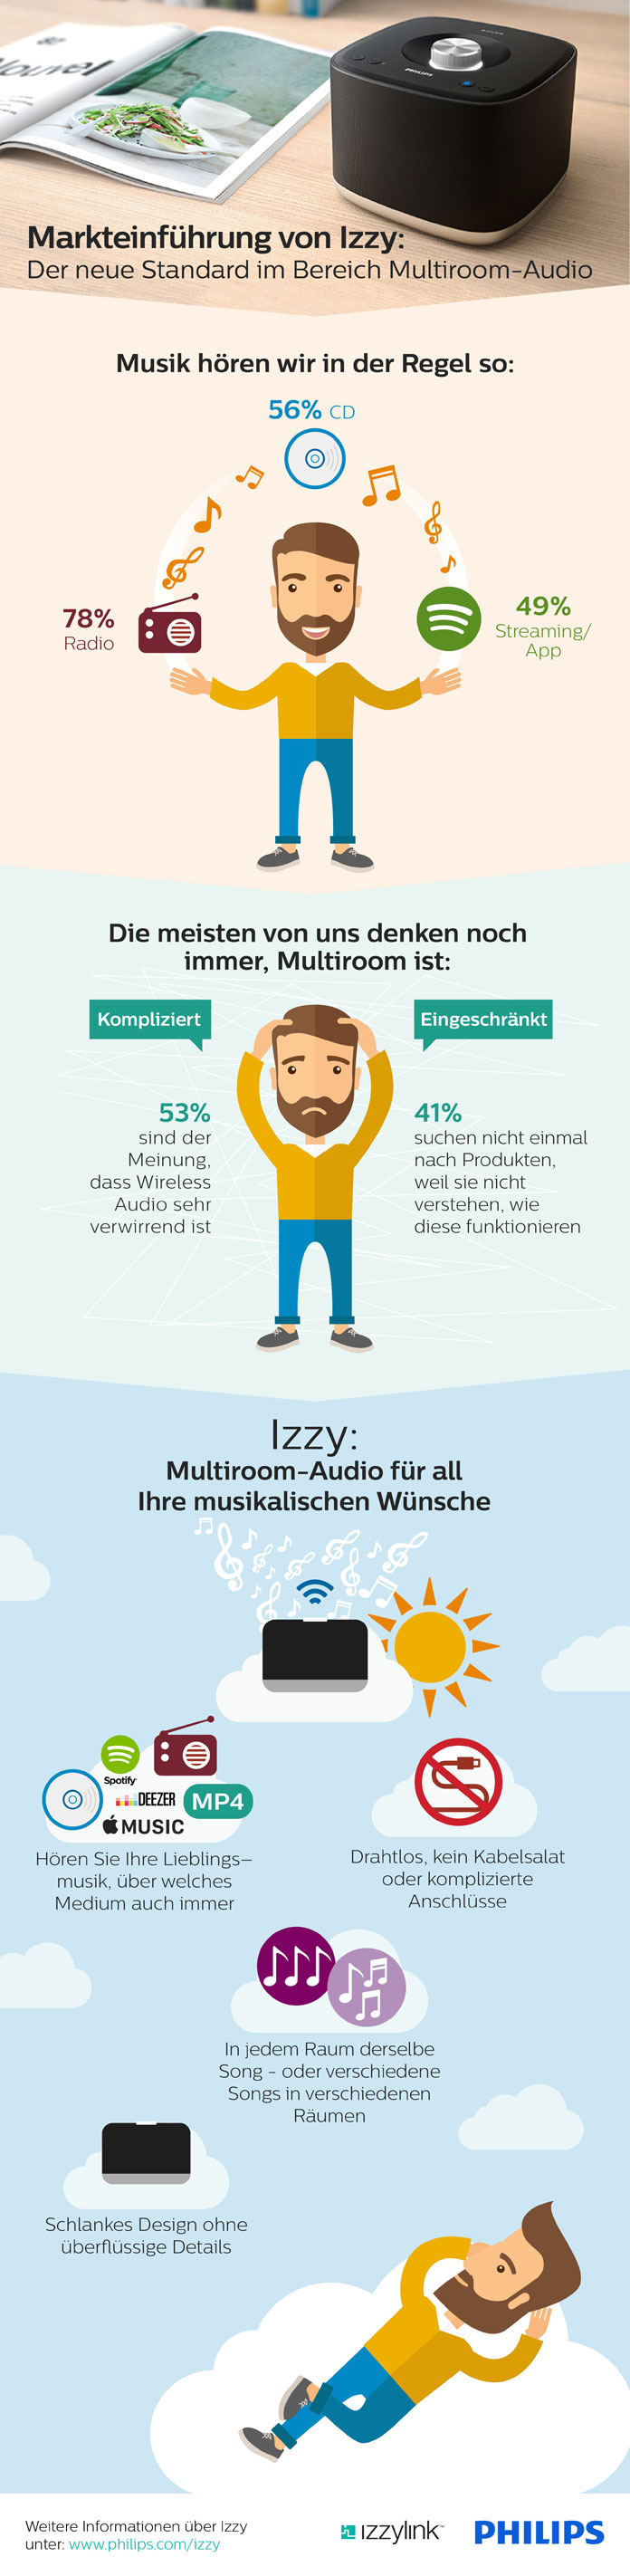 philips-izzy-infografik